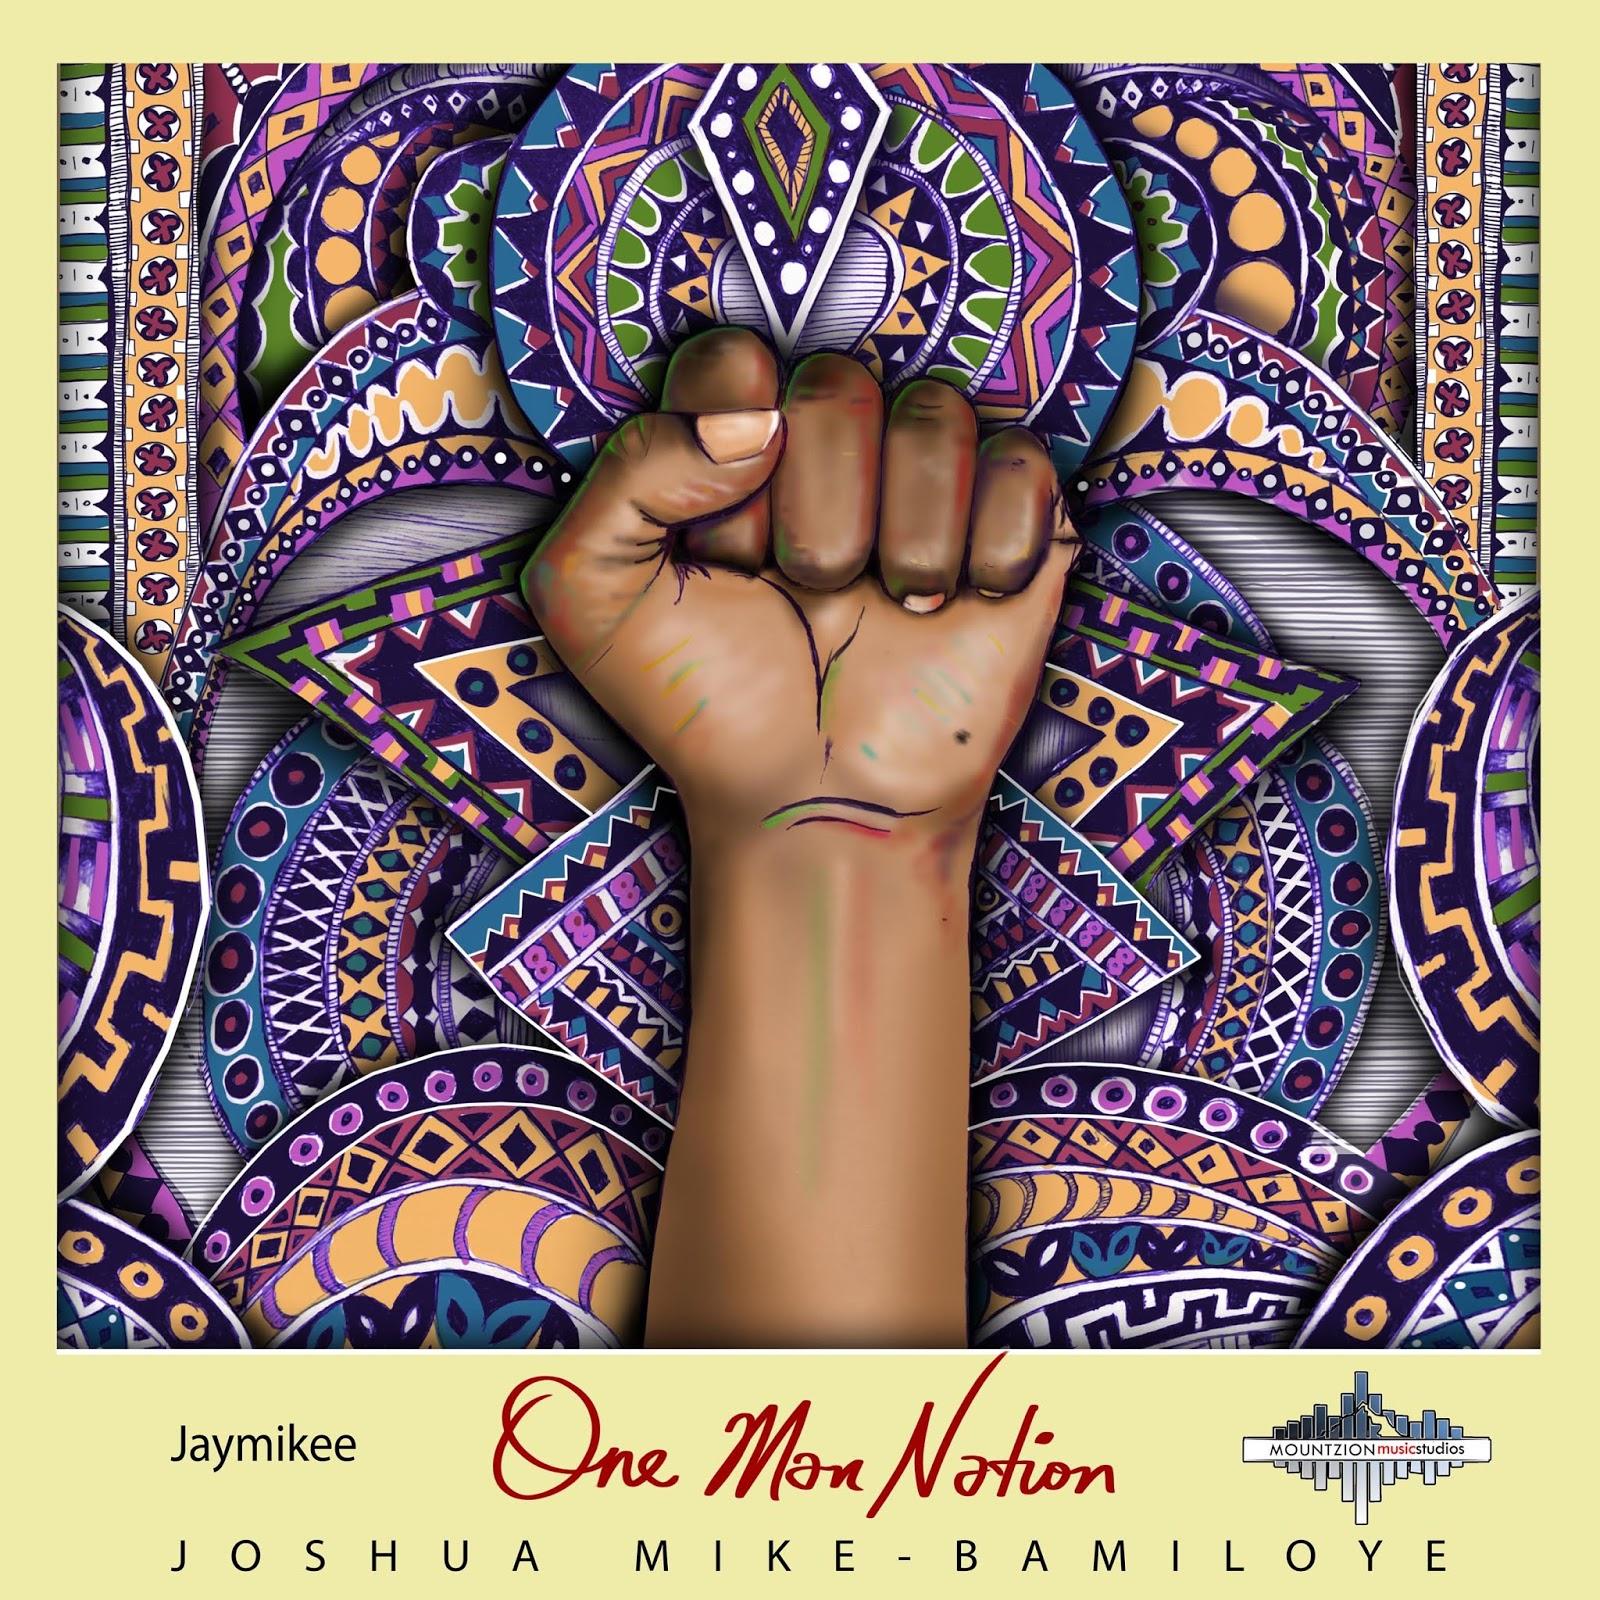 One Man Nation. Jay Mikee. Joshua Mike Bamiloye